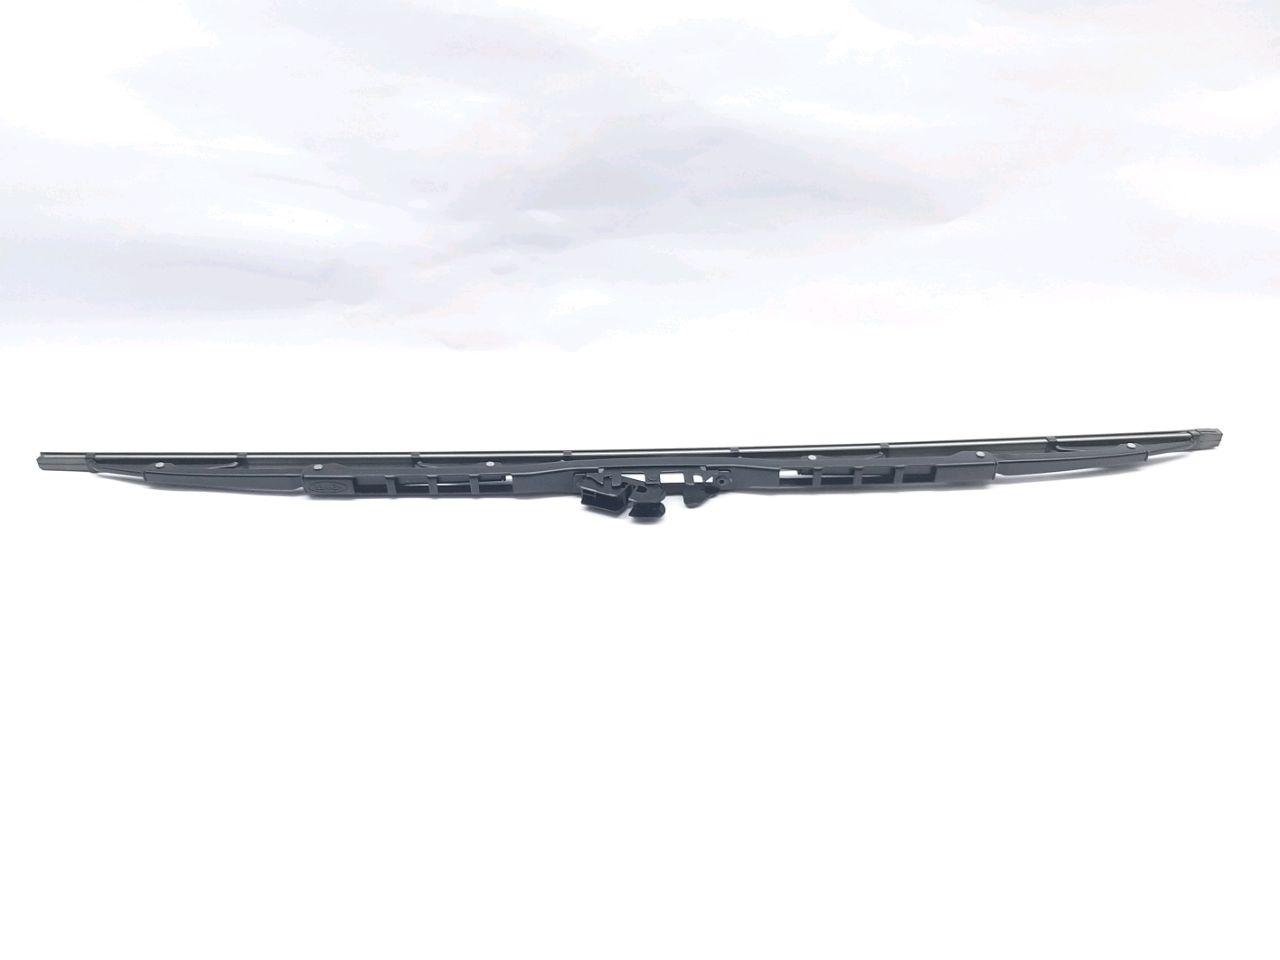 Perie stergatoare p/parbriz 60cm HEYNER Exclusive